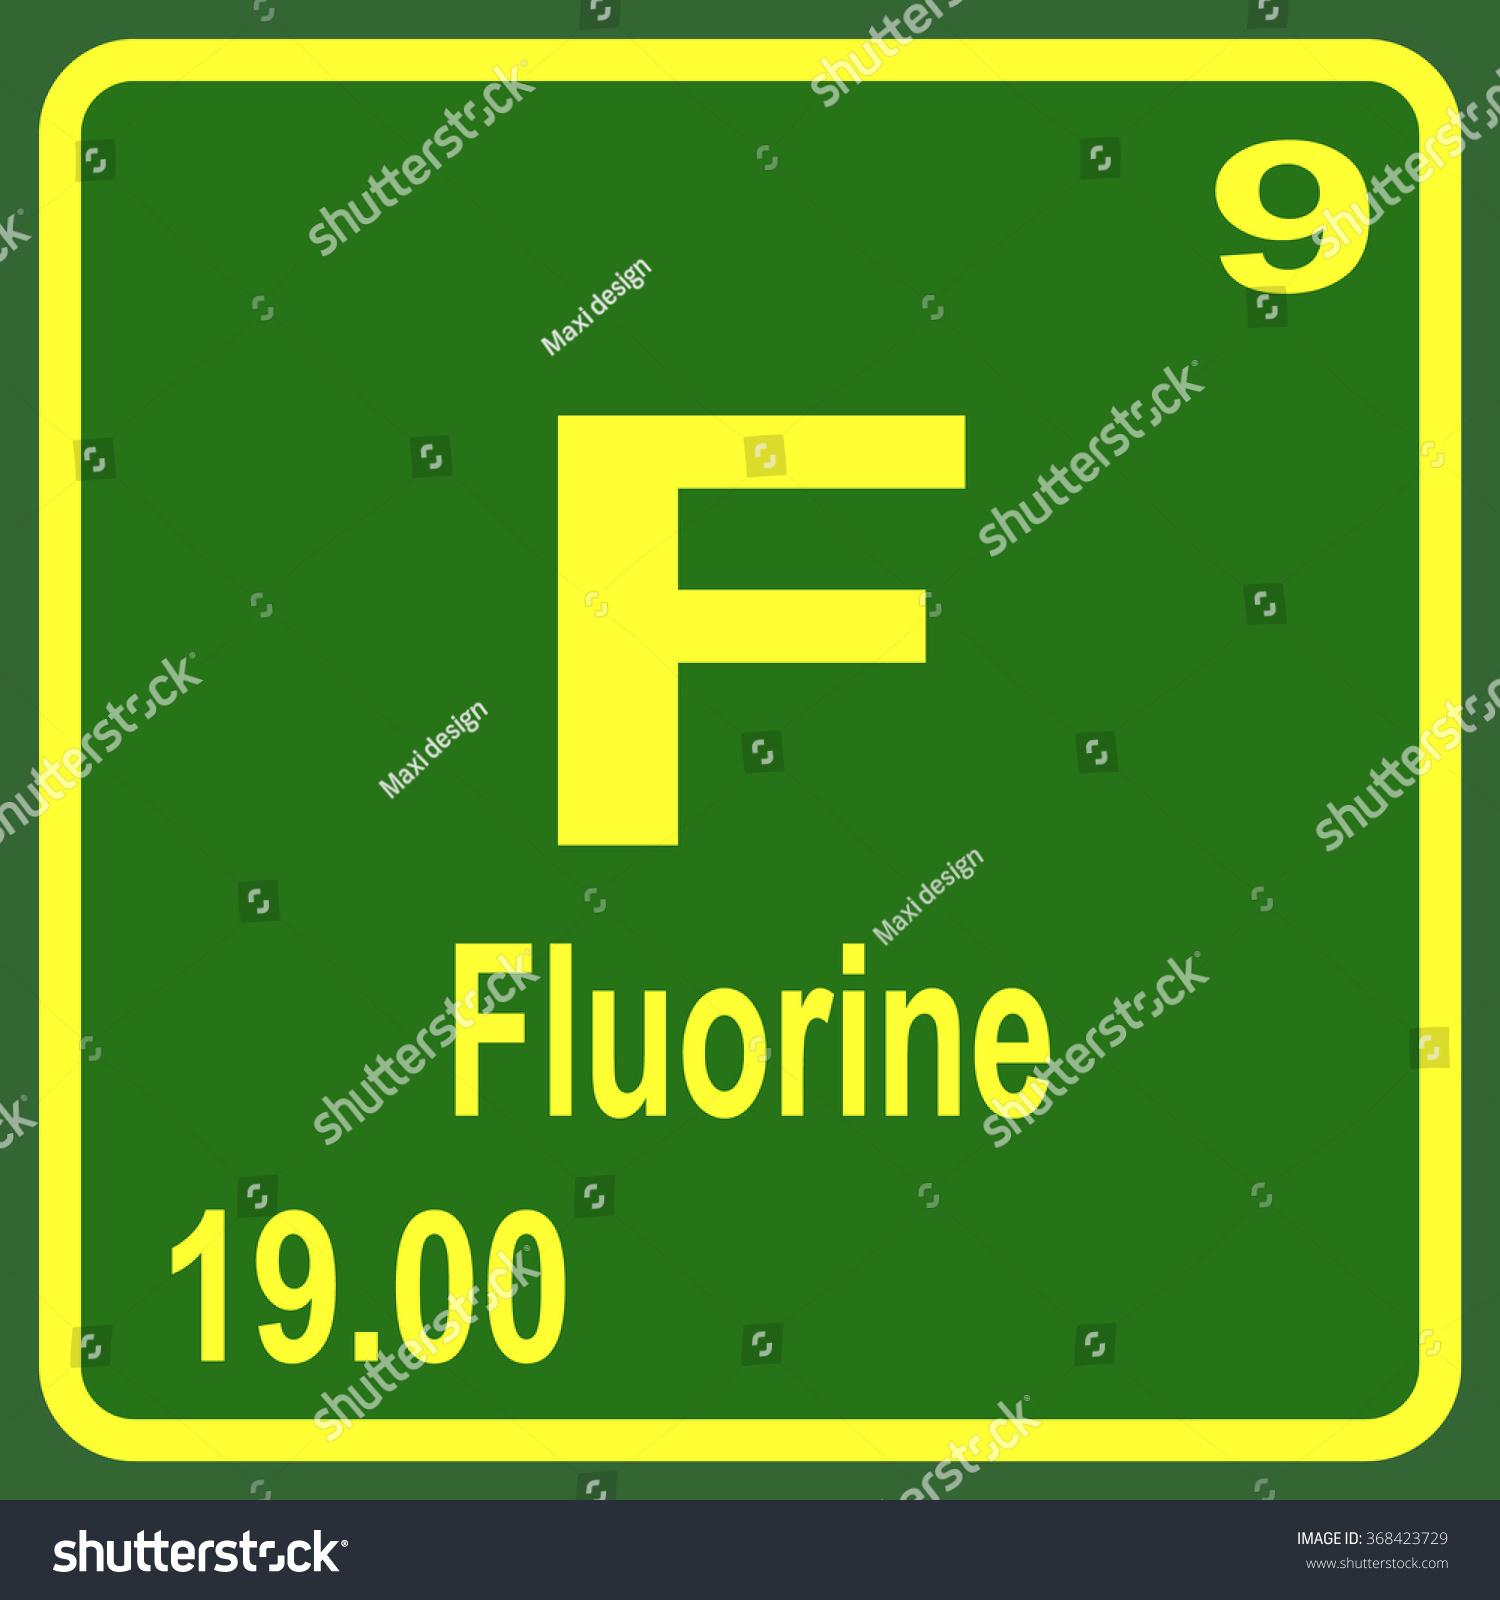 Periodic table elements fluorine stock vector 368423729 shutterstock periodic table of elements fluorine gamestrikefo Gallery